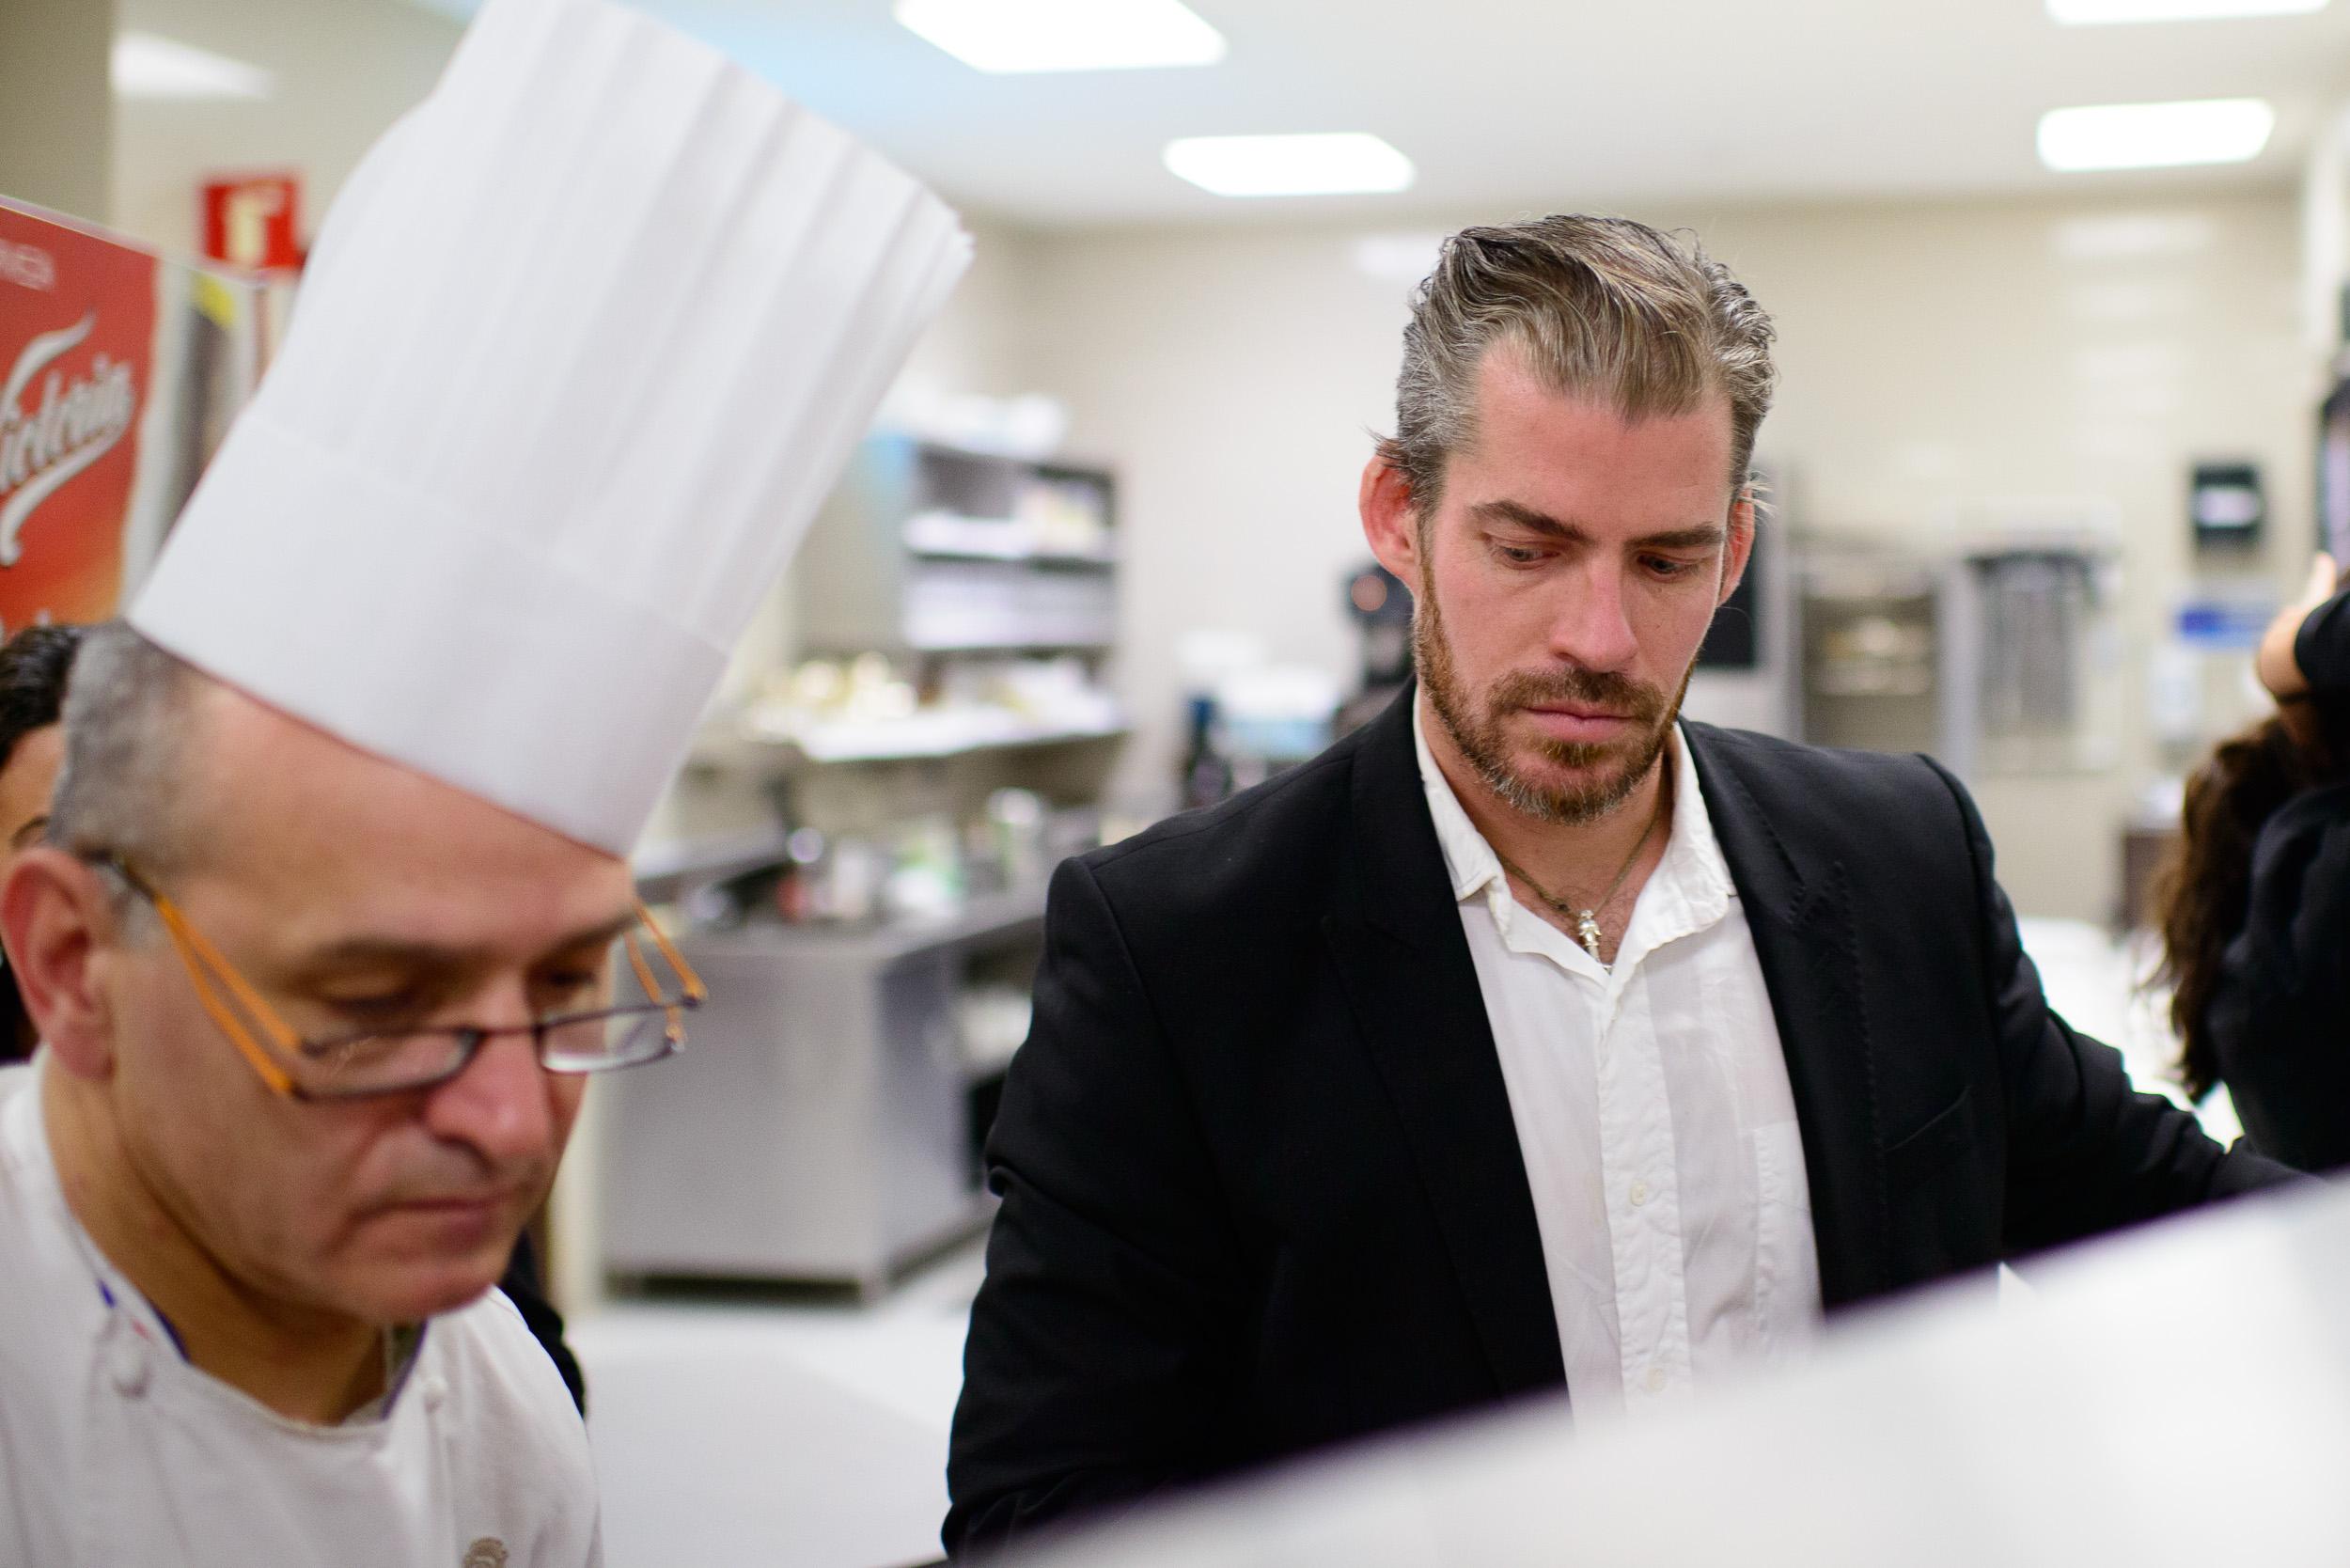 Chef Guy Santoro (St. Regis, DF) and Lars Williams (Nordic Food